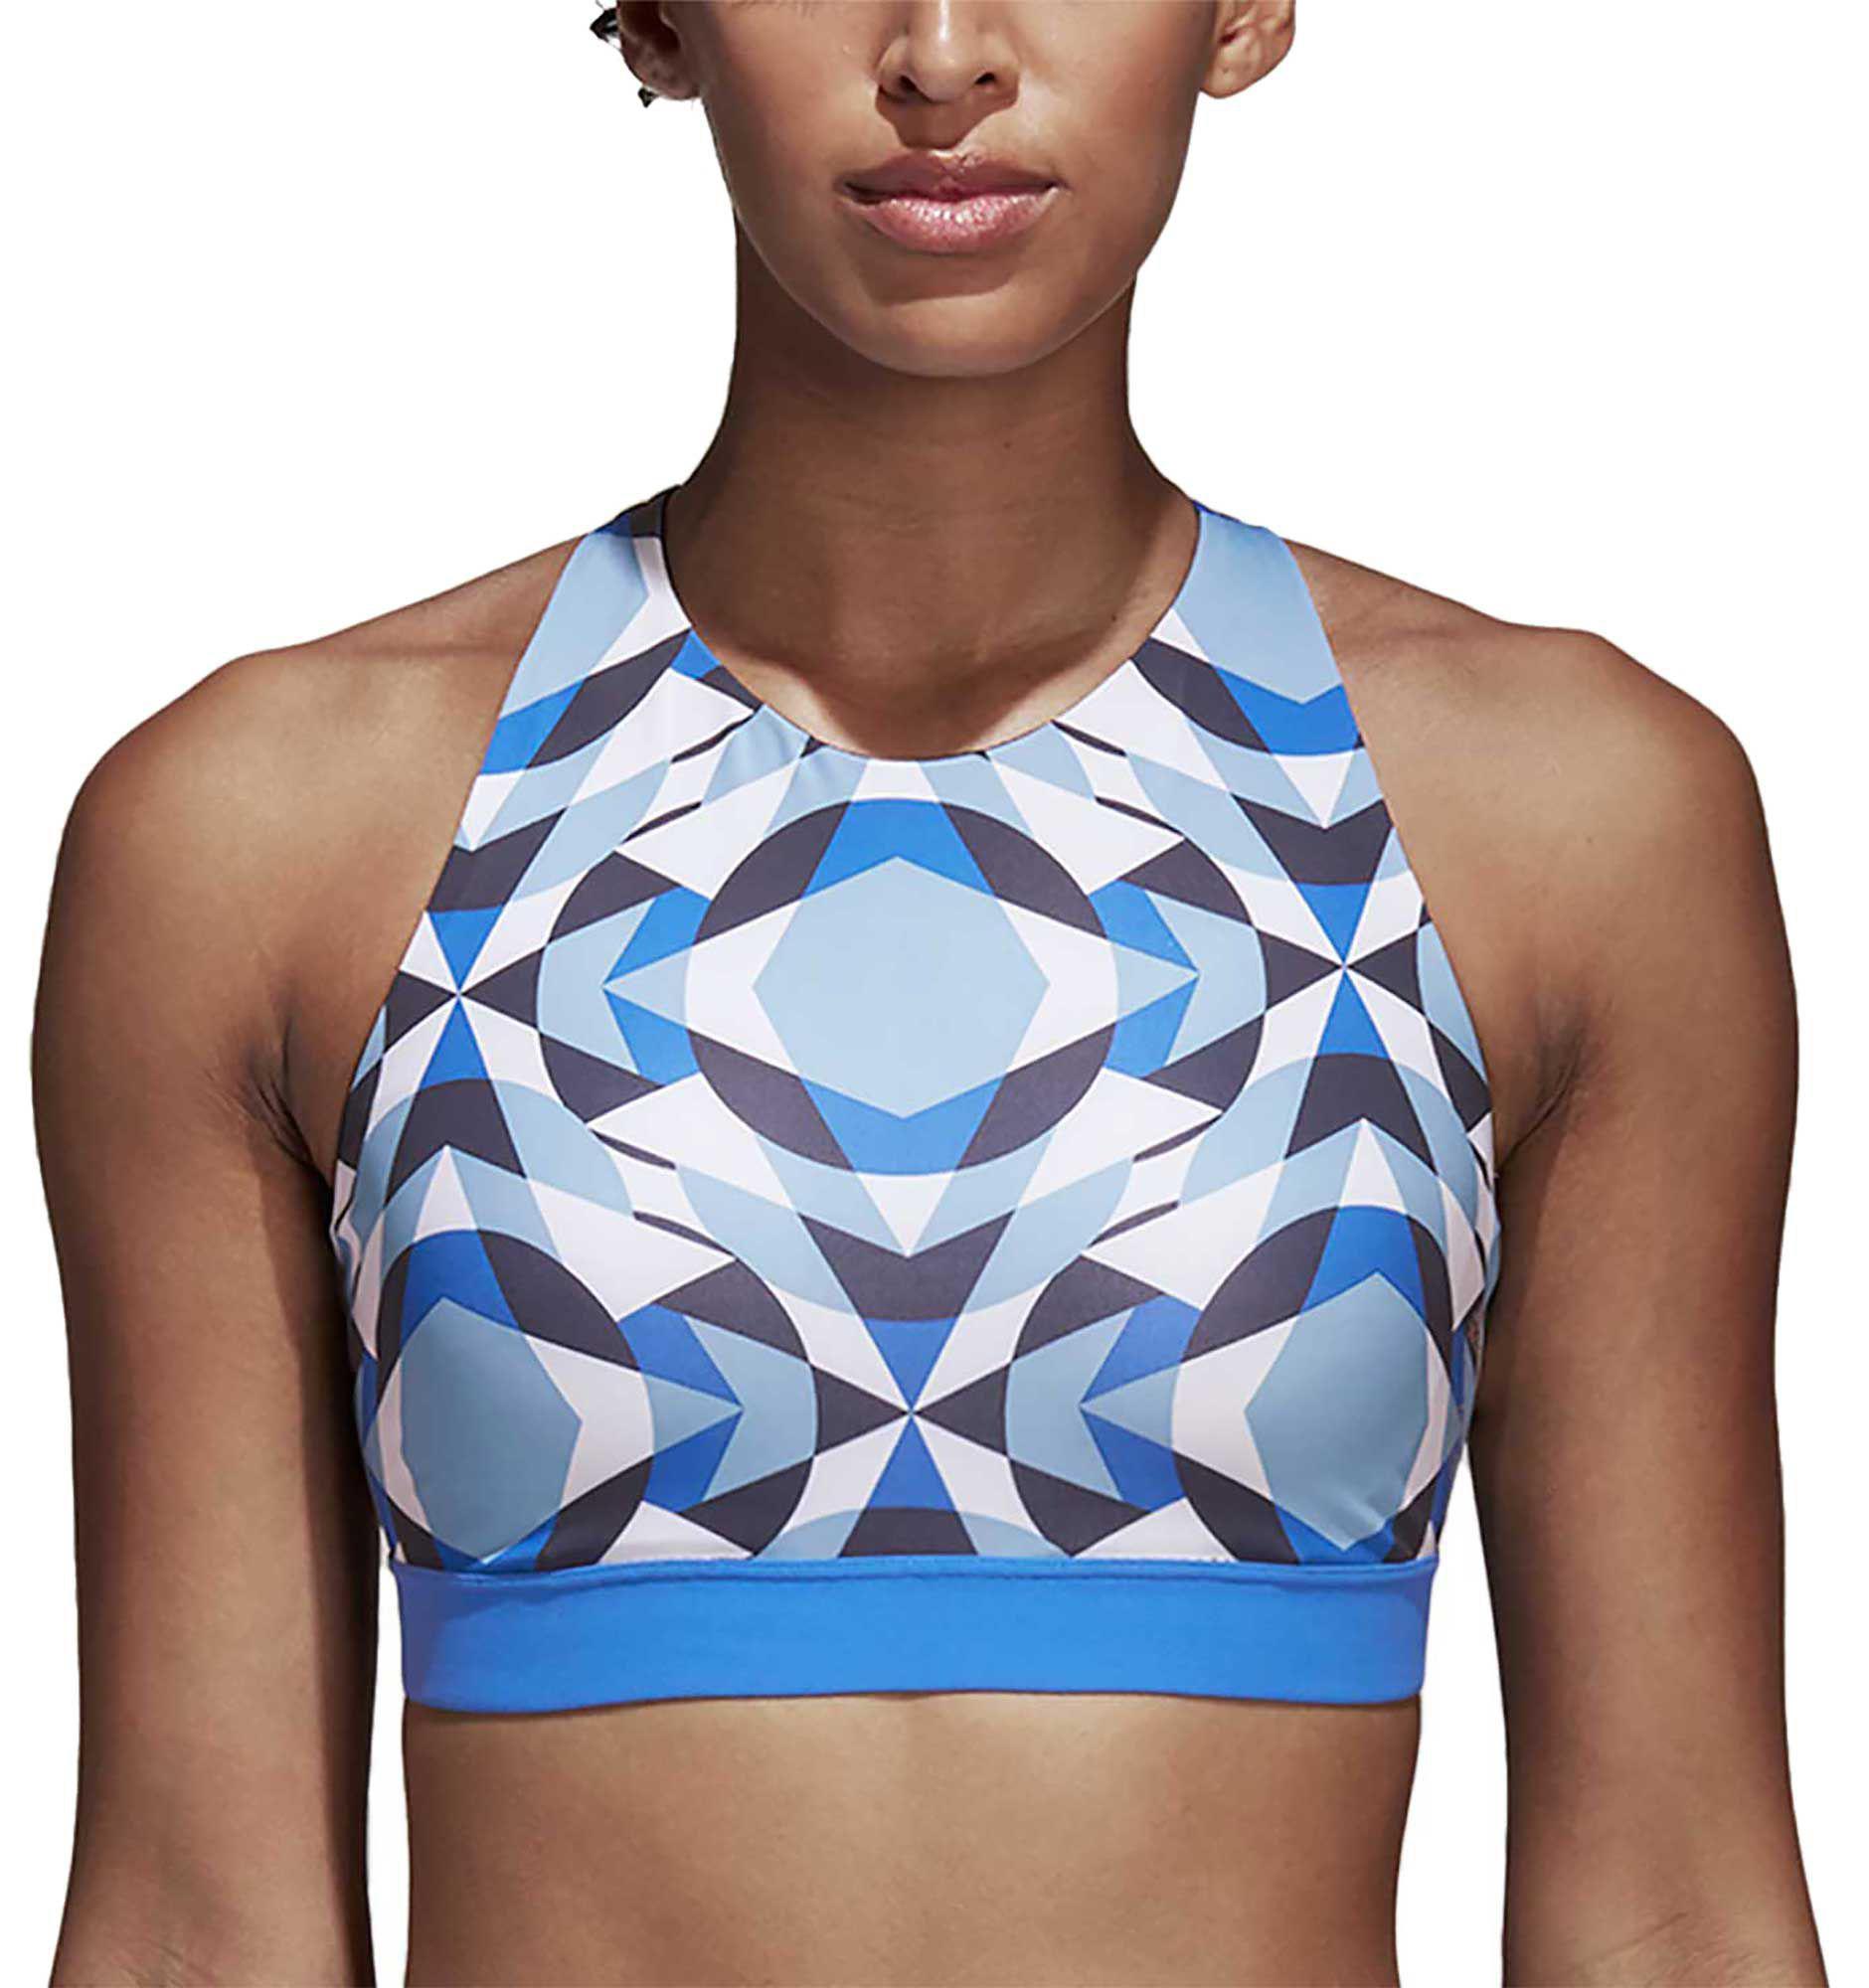 34aade9a0d Lyst - adidas Wanderlust Yoga Halter Sports Bra in Blue